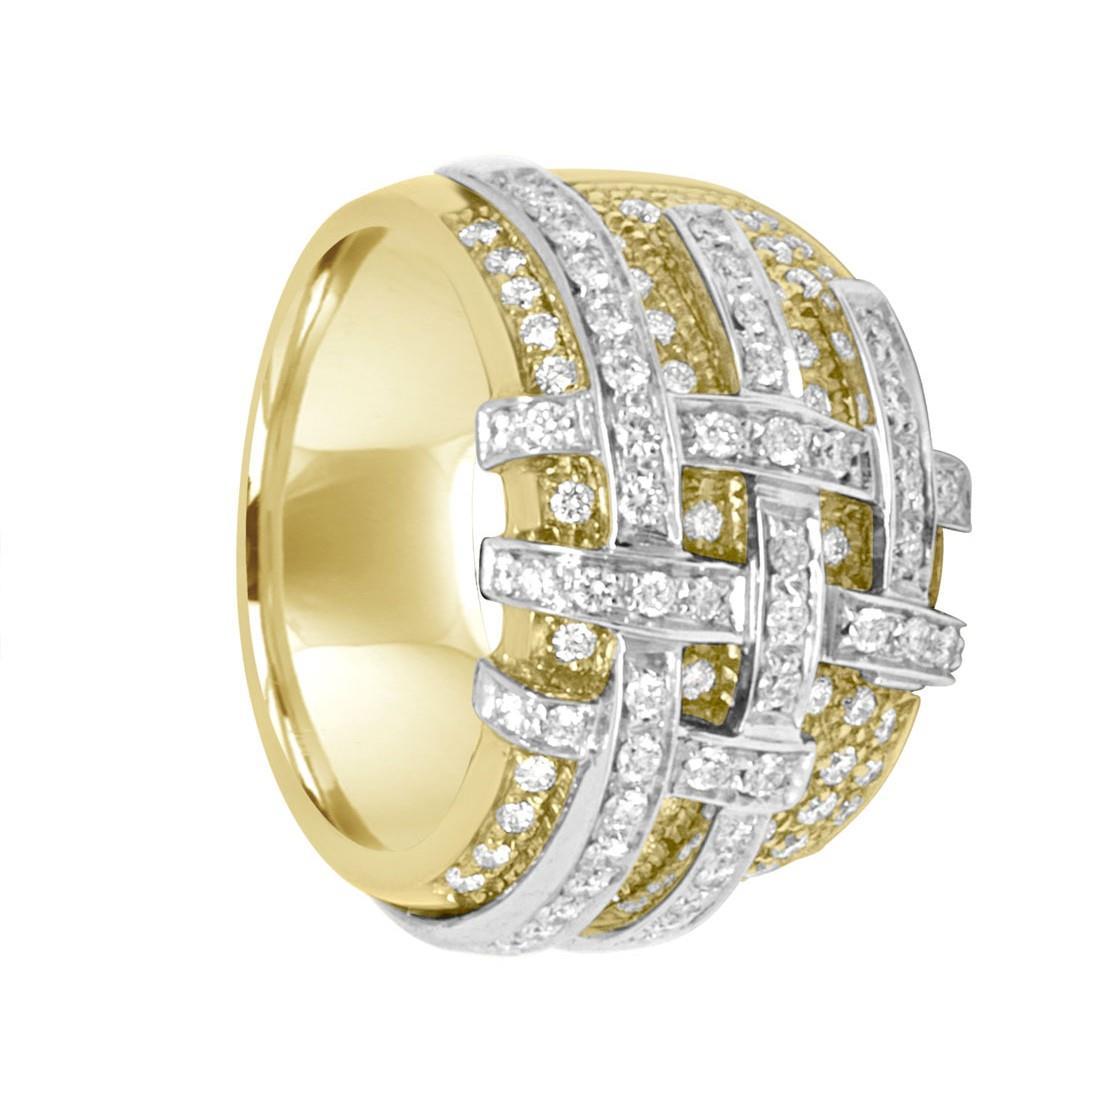 Anello Damiani in oro giallo con diamanti ct 0,97 - DAMIANI